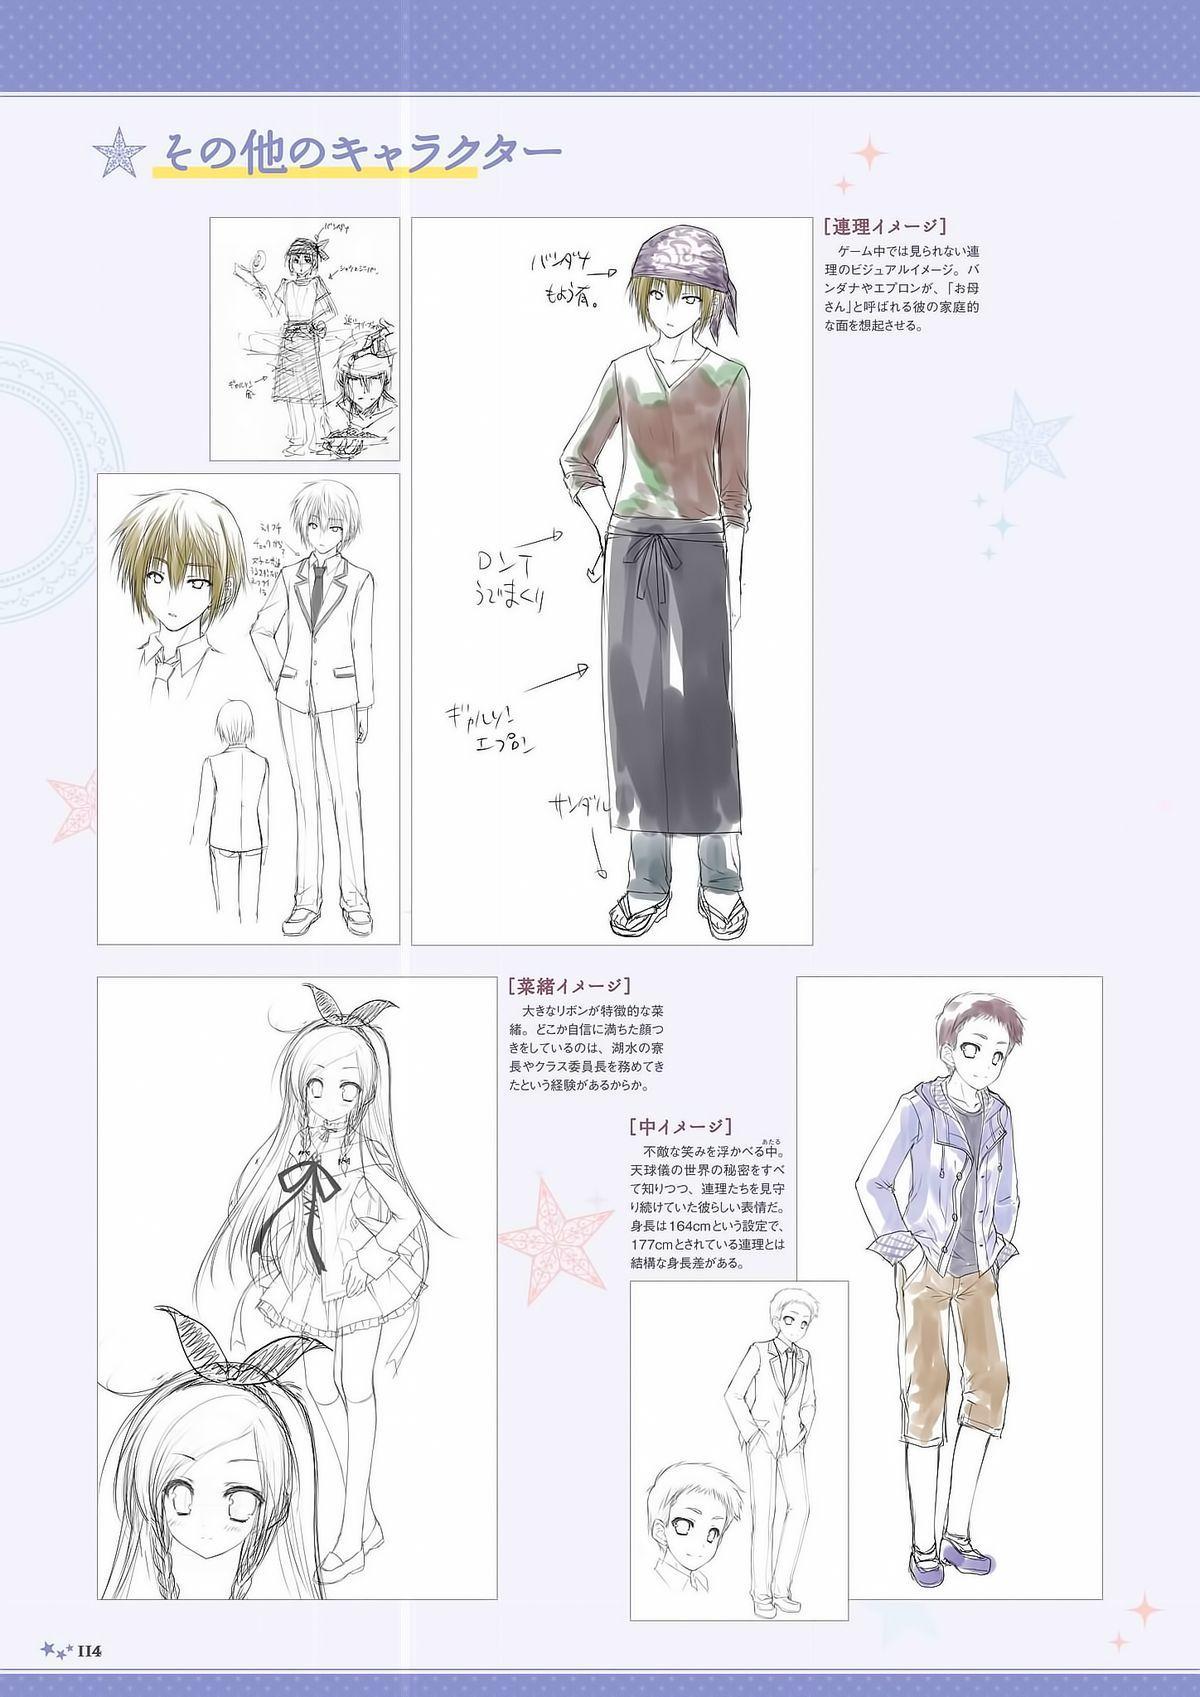 Sekai to Sekai no Mannaka de Visual Fanbook 111